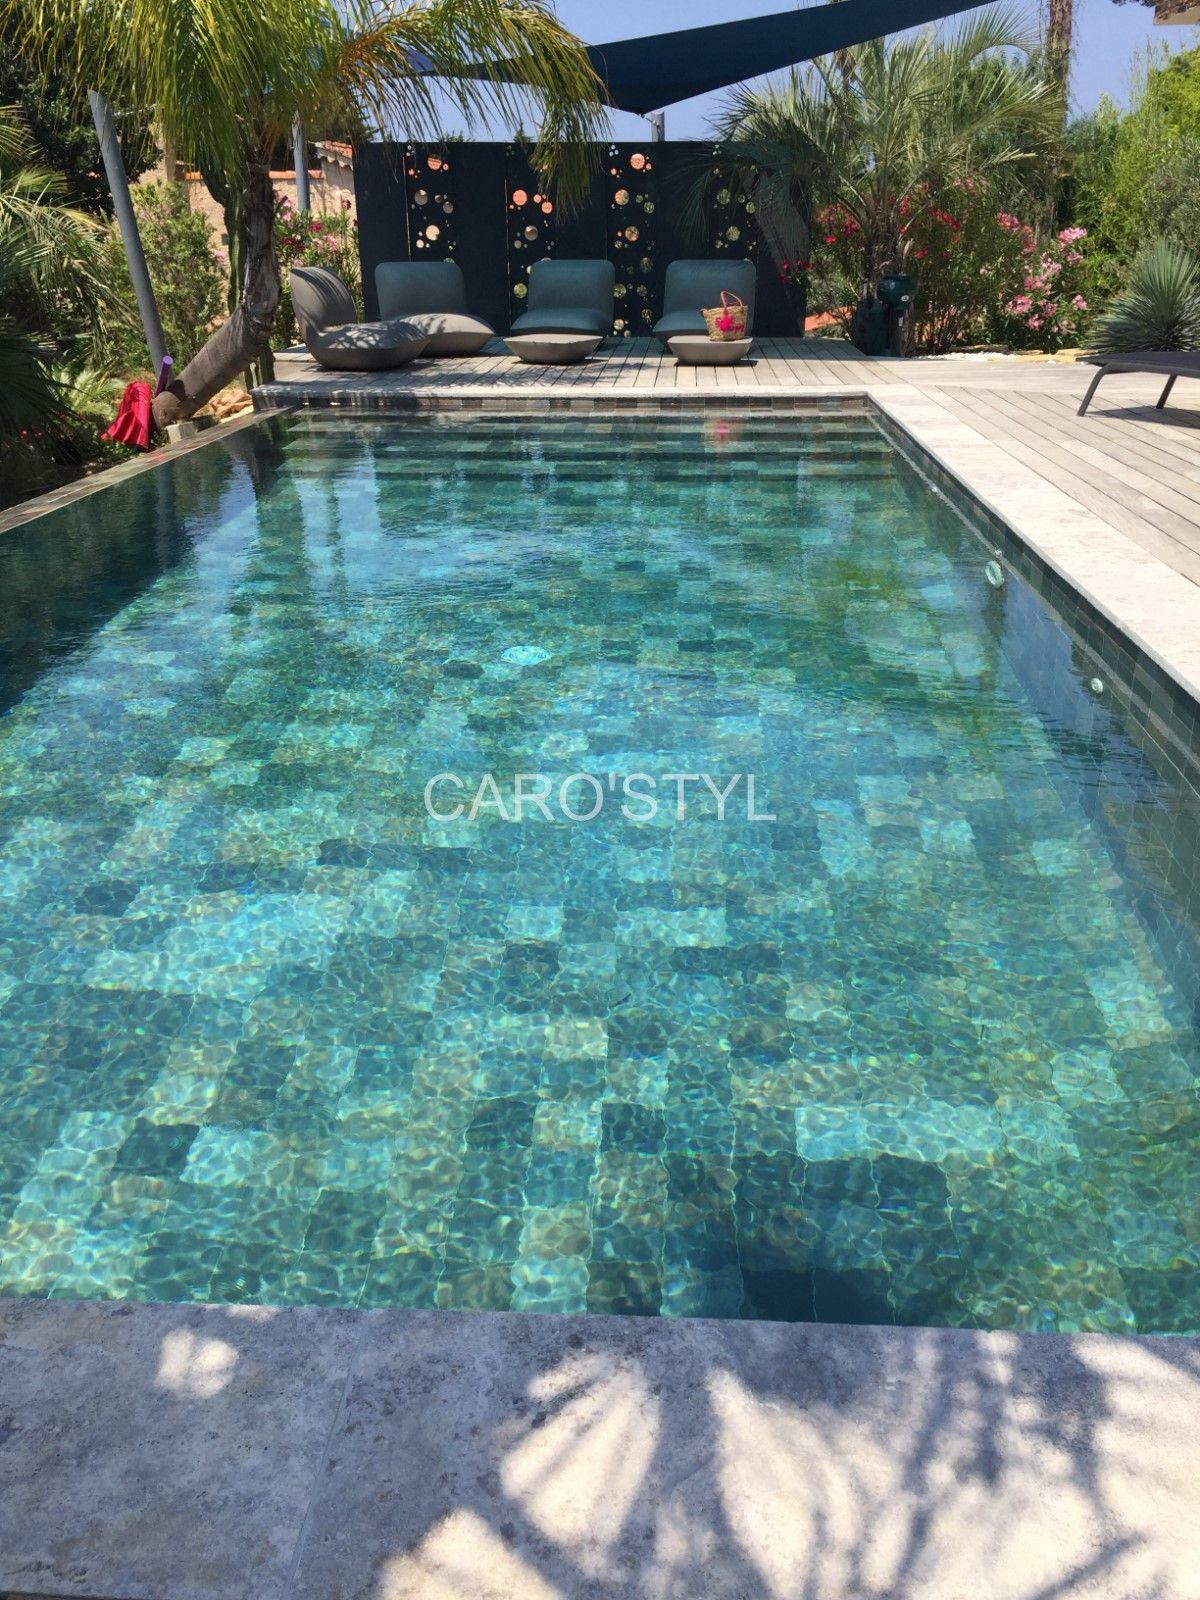 Carrelage pour piscine verte ce carrelage effet pierre - Revetement piscine pierre naturelle ...